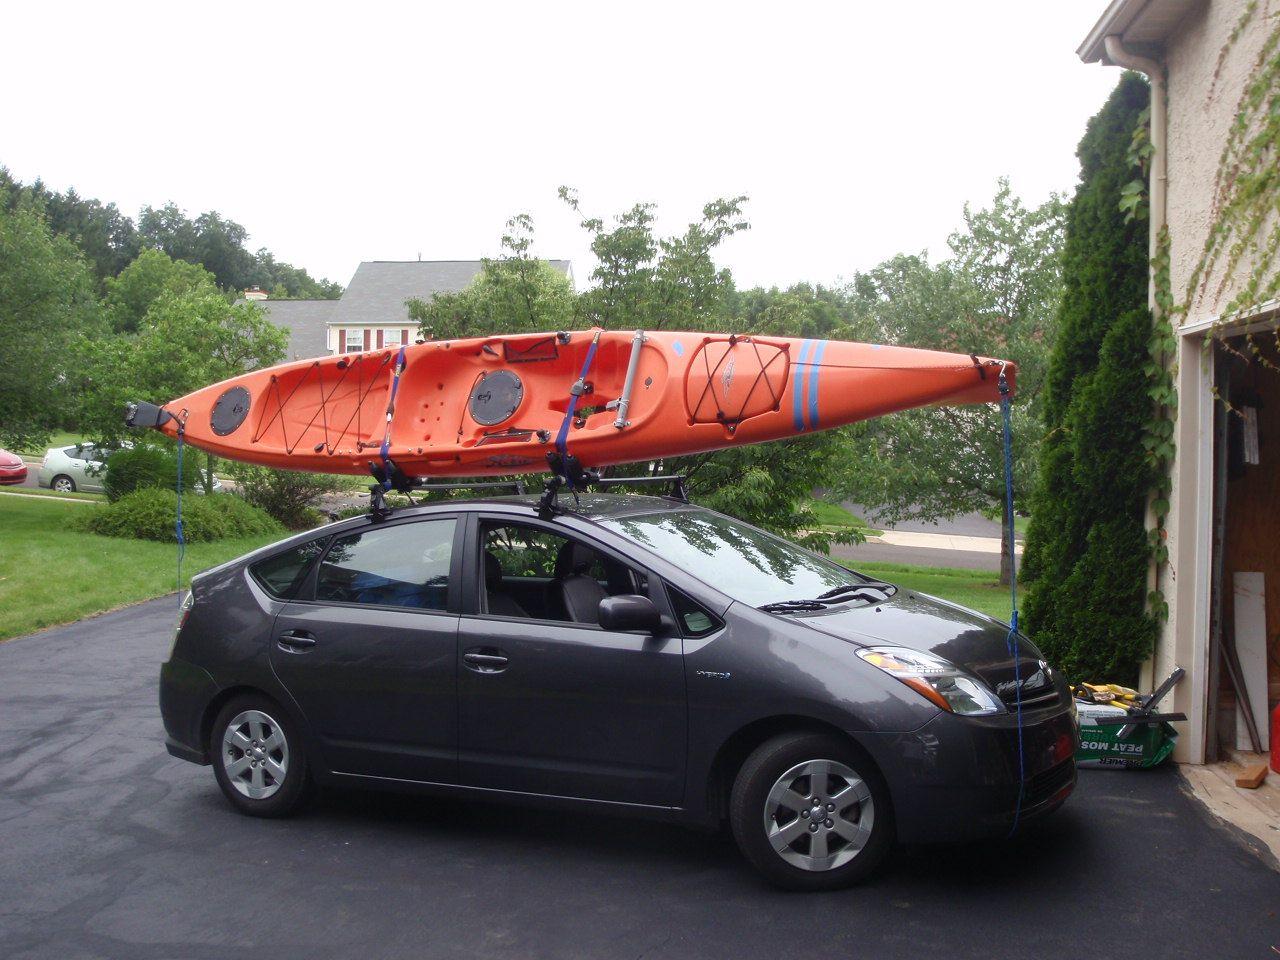 Show Your Toyota Prius Car Topping A Kayak Kayaking And Kayak